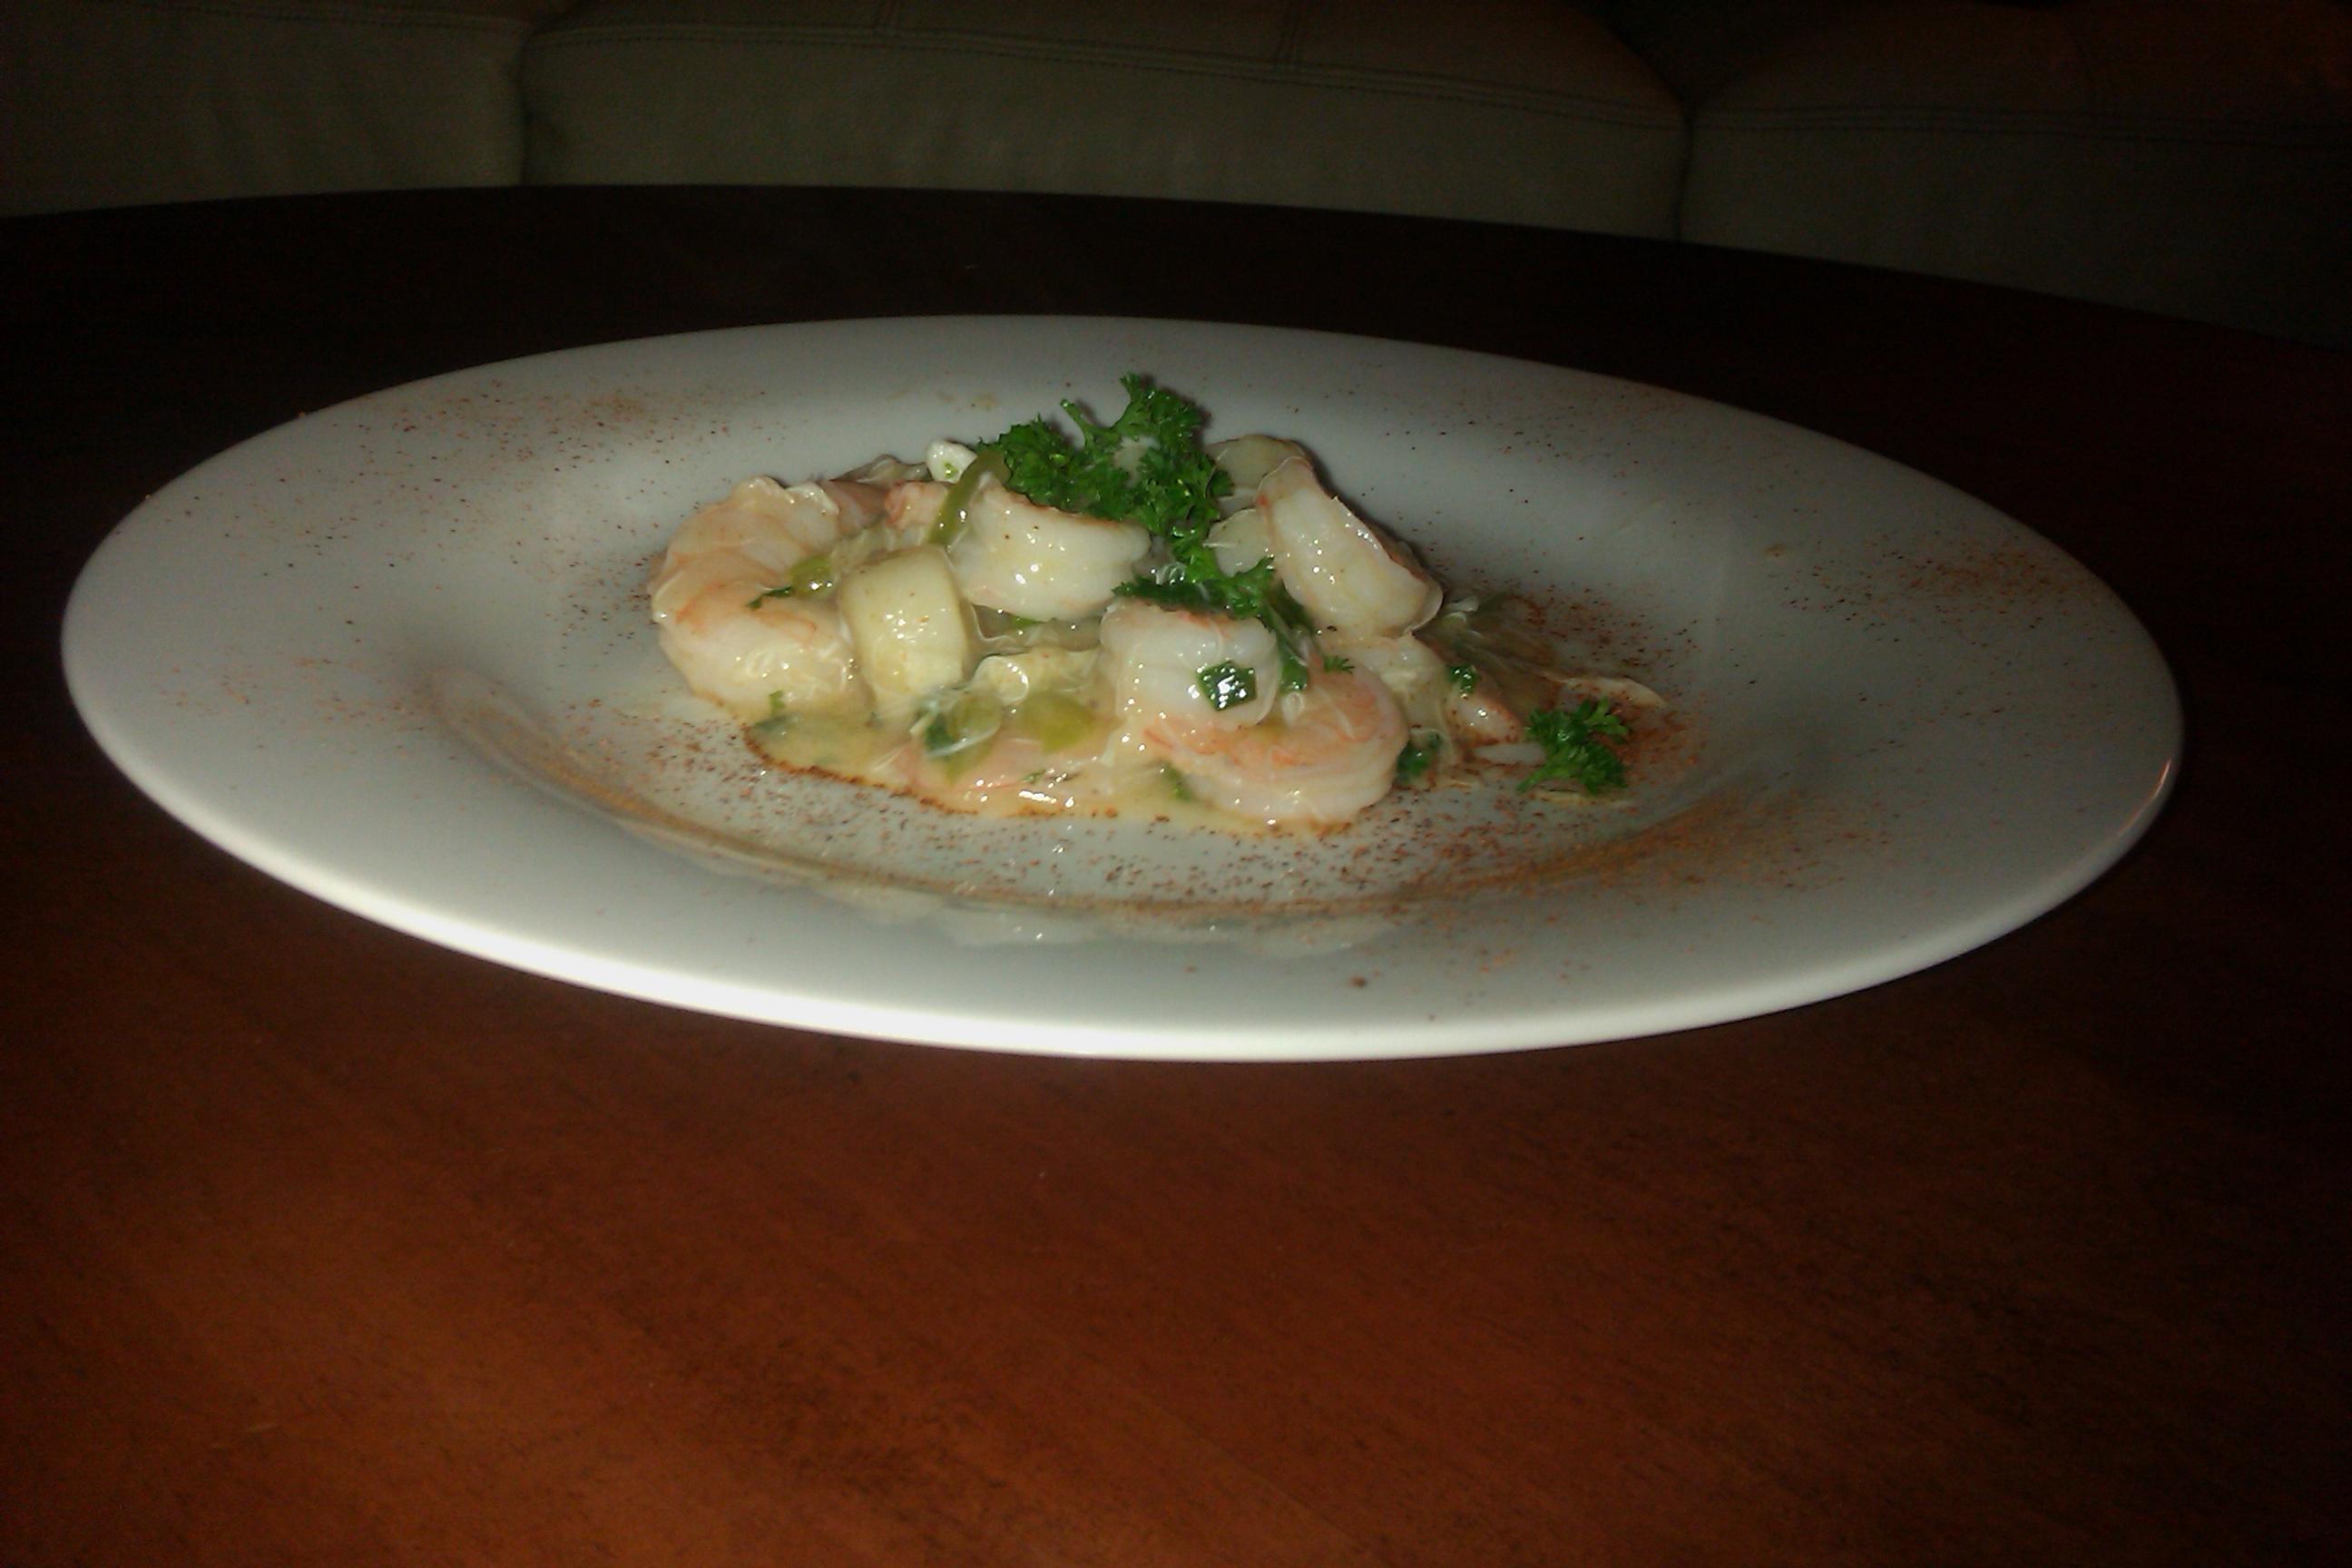 Tampa, Fl :: Culinary school homework. Seafood Etouffee